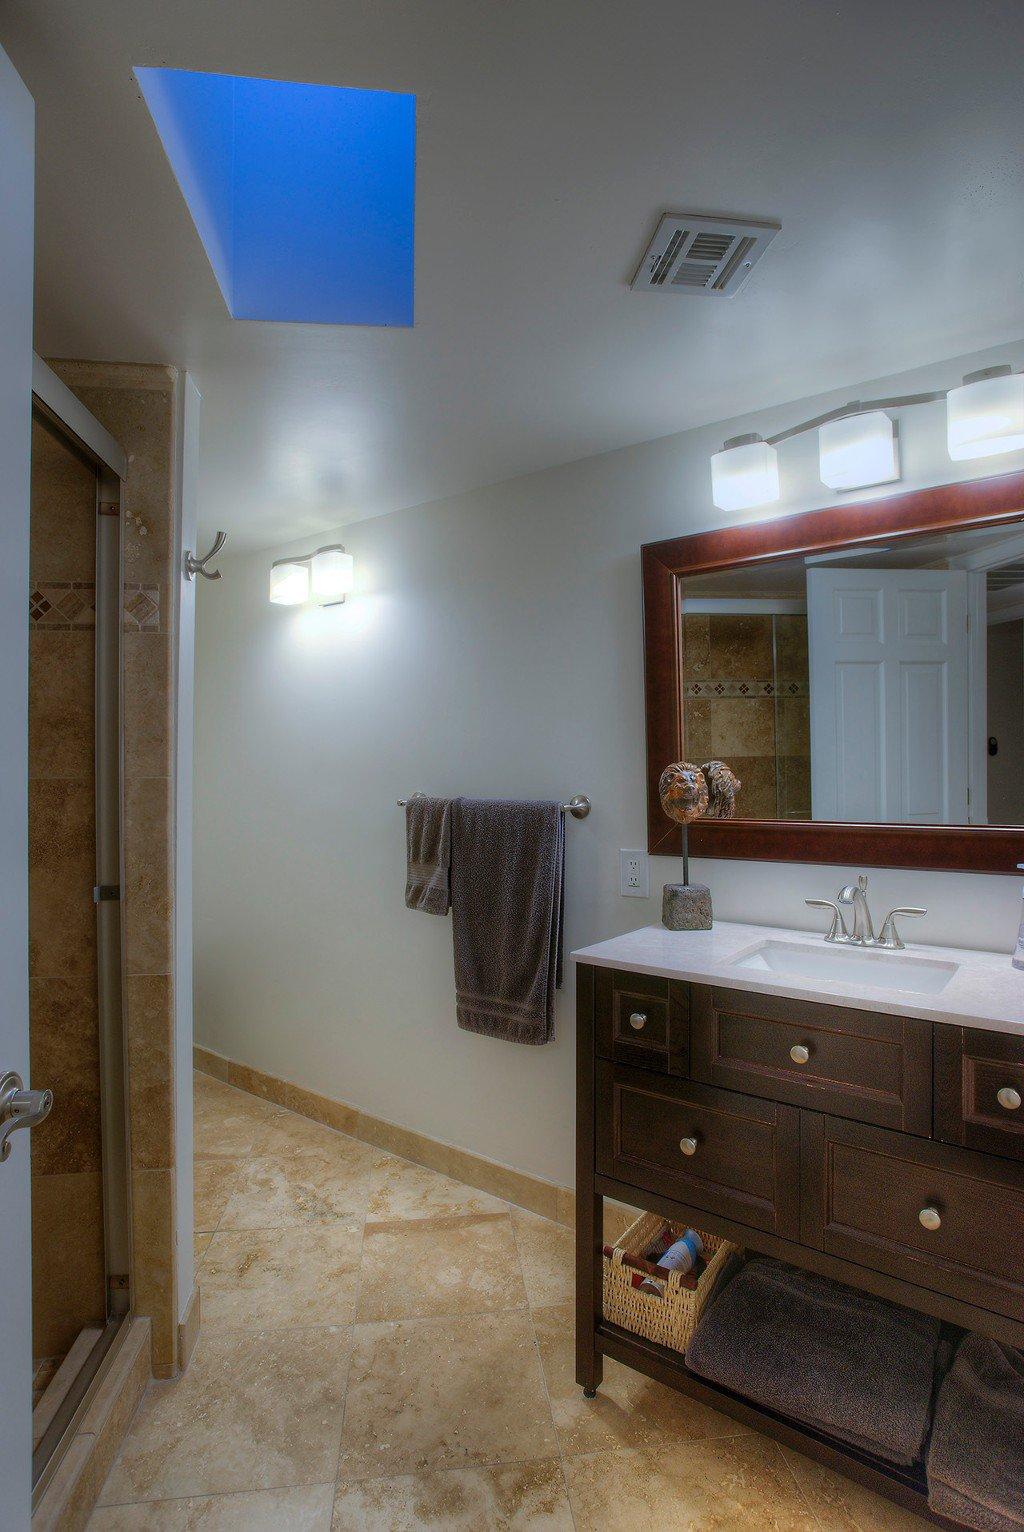 Photo 10: Photos: 8153 E Del Barquero Drive in Scottsdale: McCormick Ranch House for sale : MLS®# 5544424